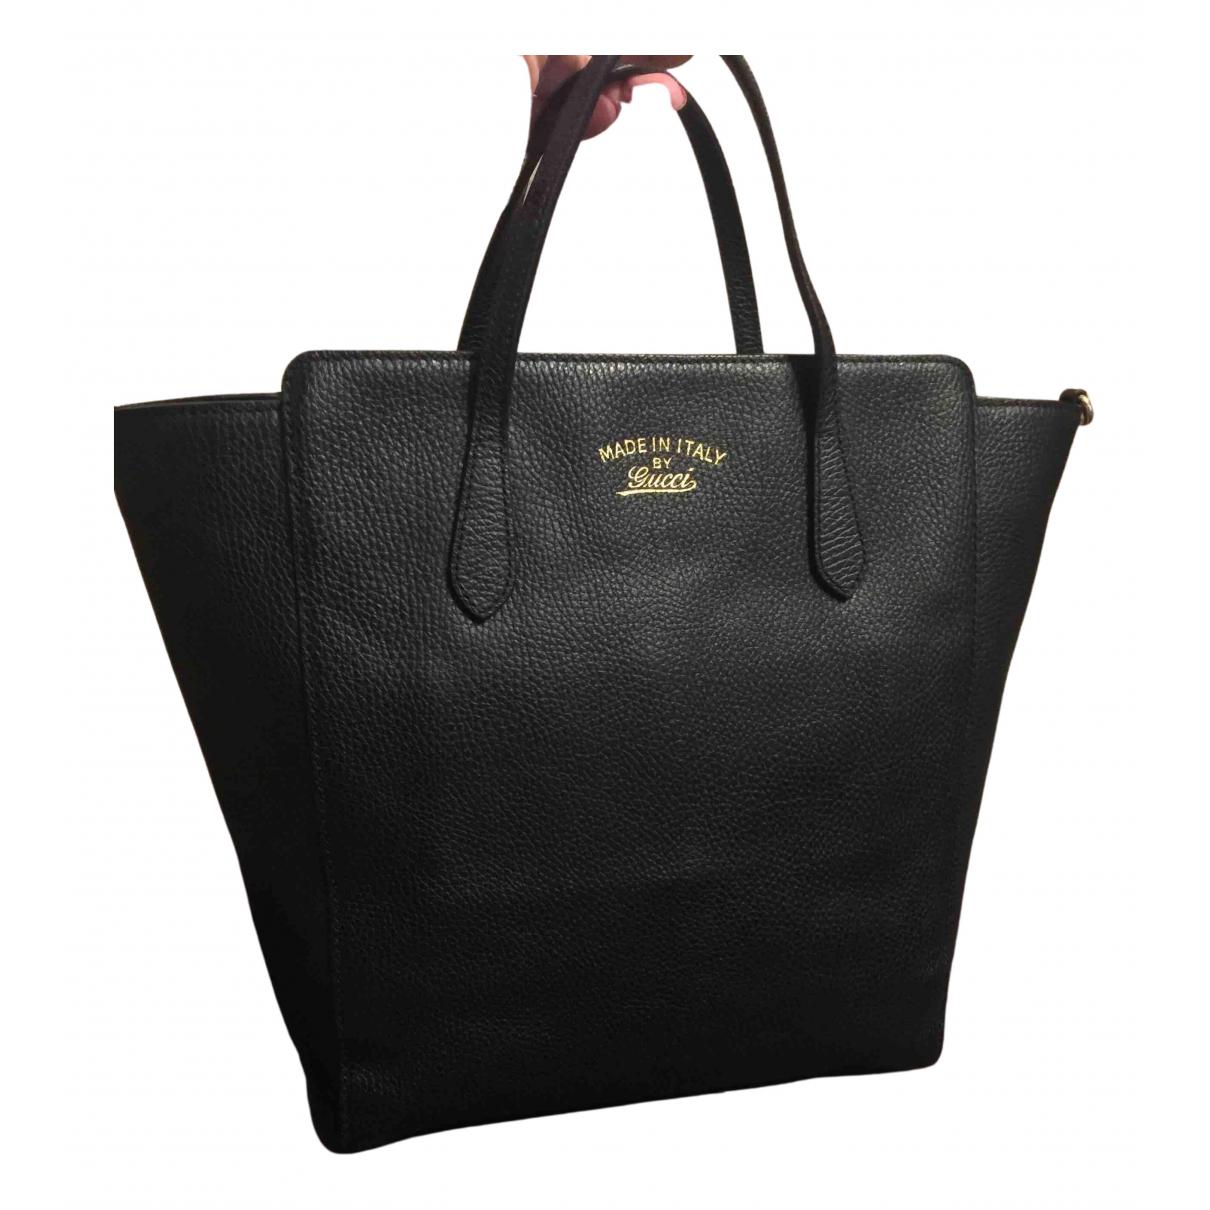 Gucci Swing Black Leather handbag for Women N